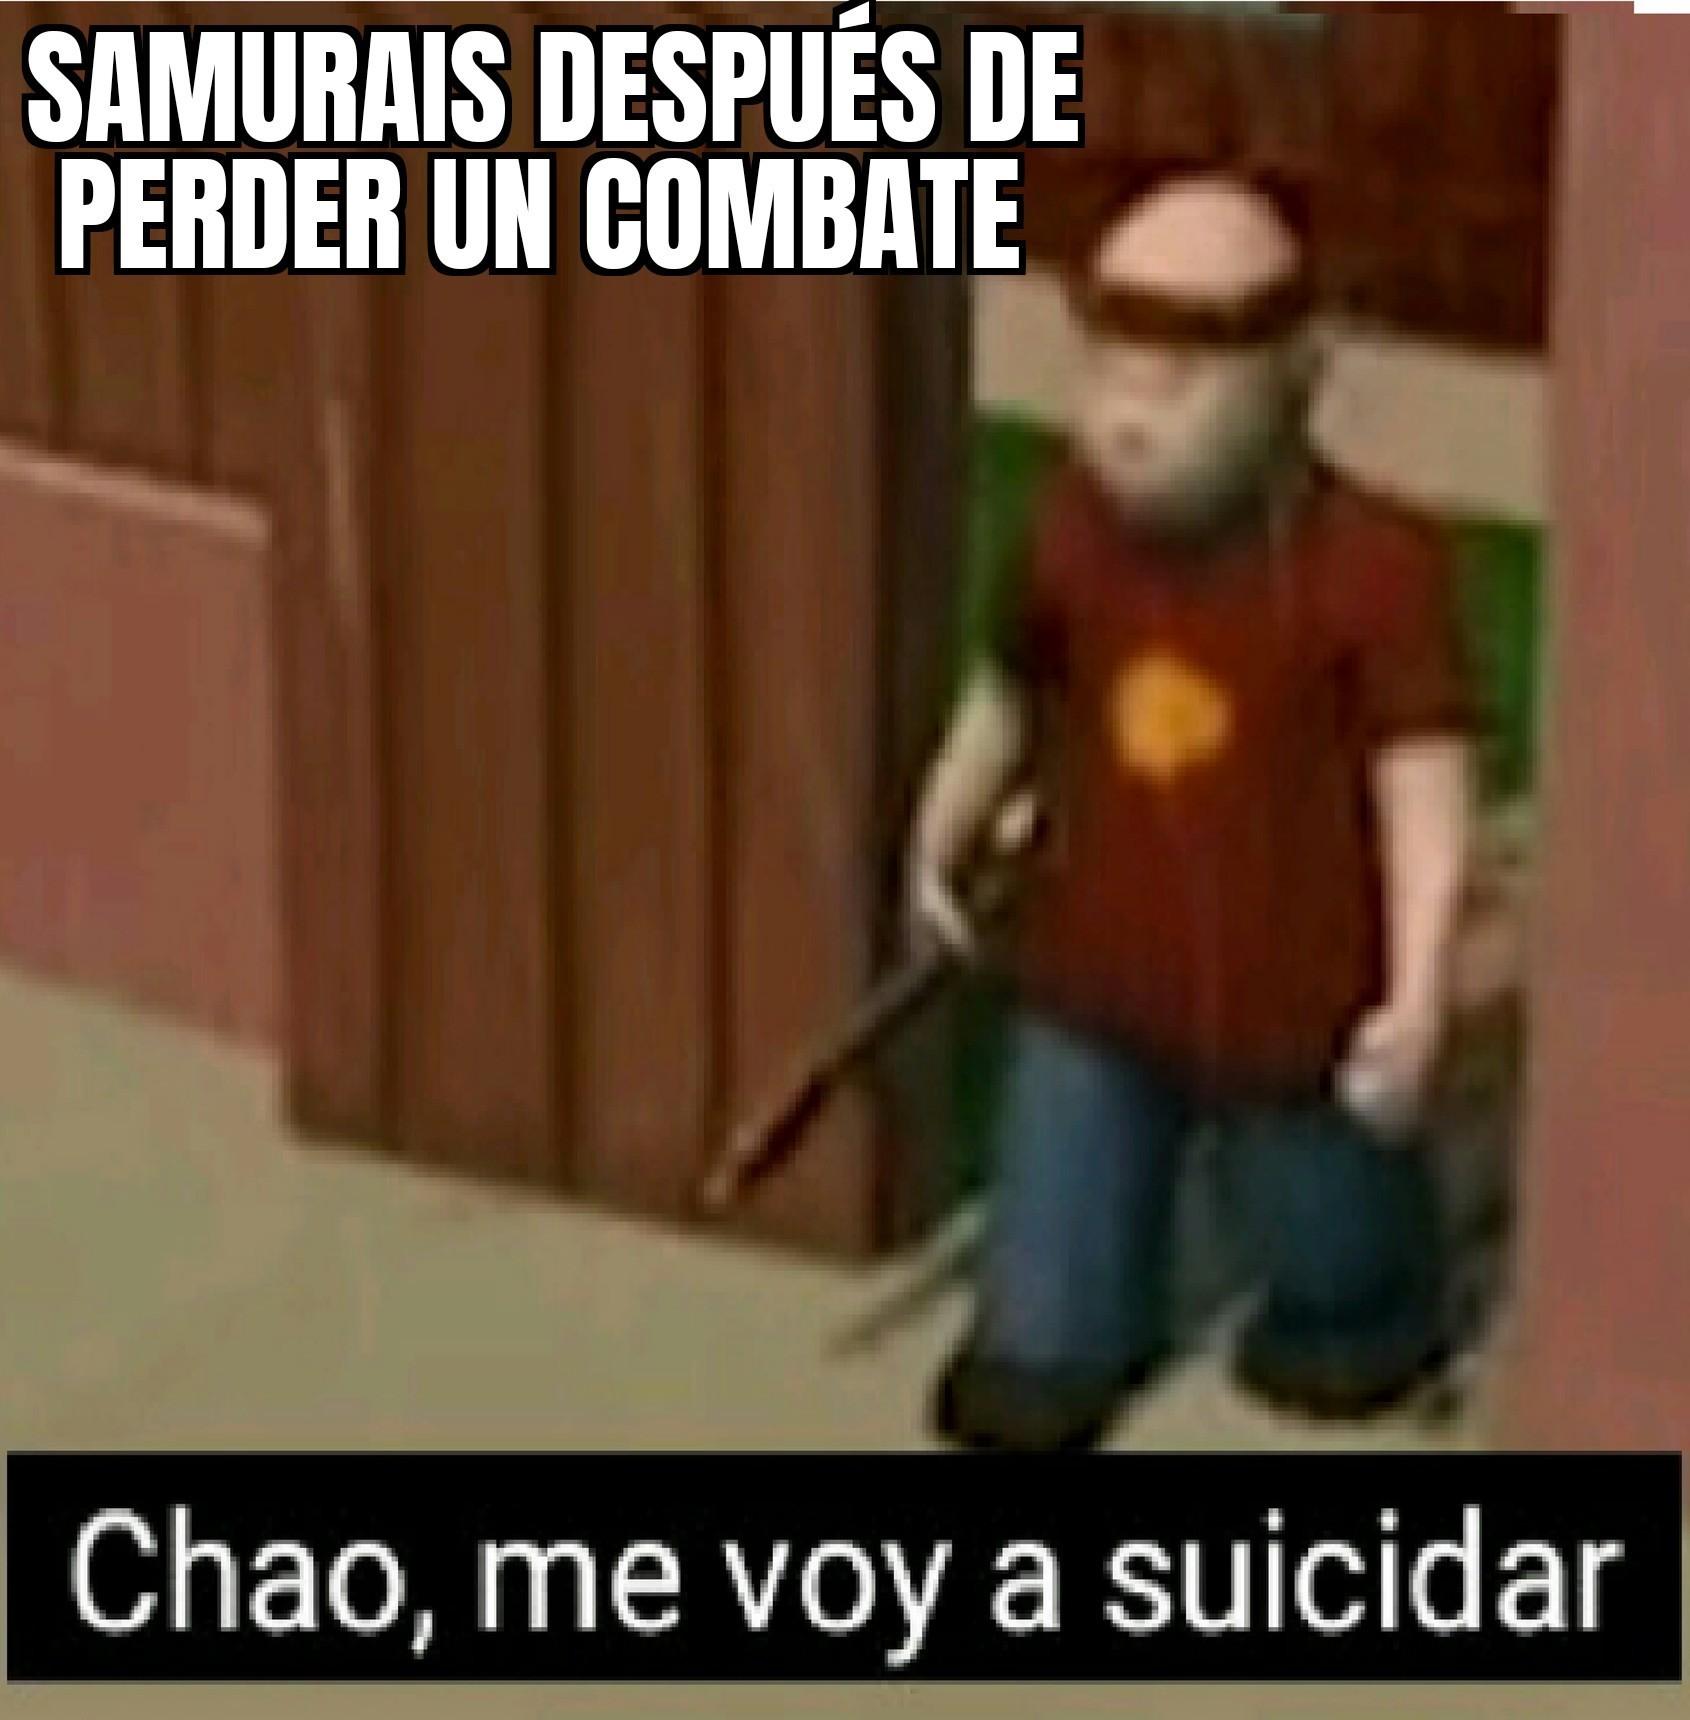 Chao - meme